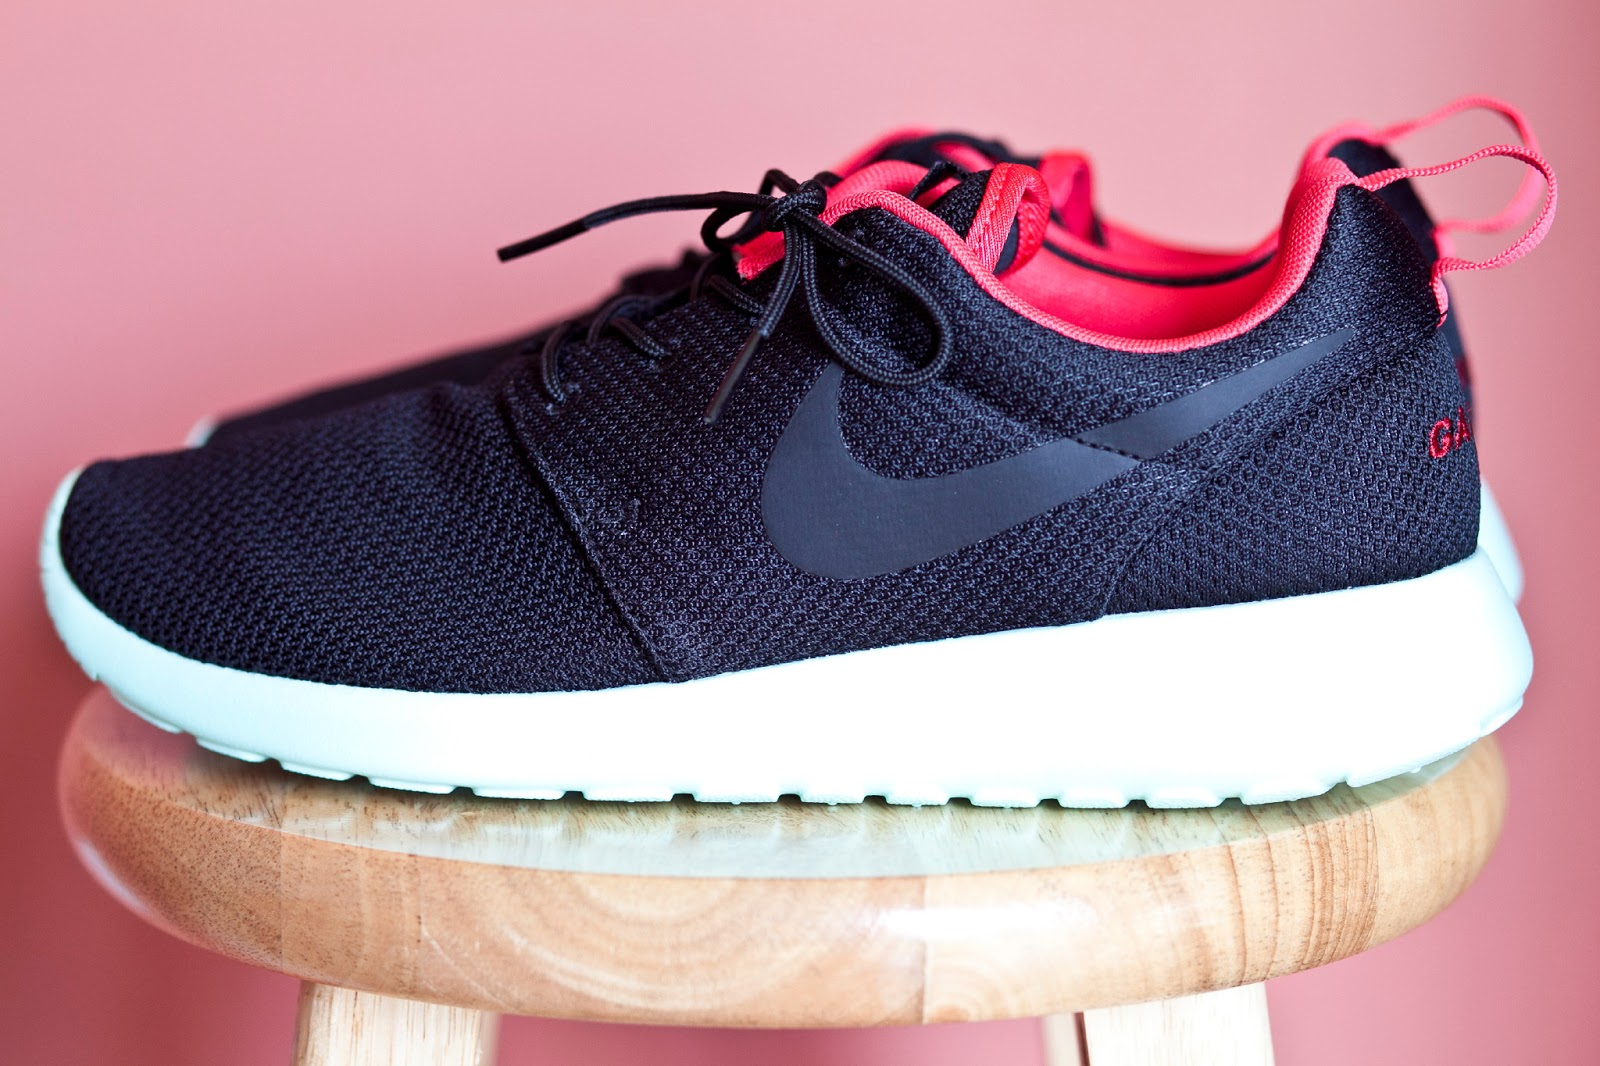 Alex Grant: Yeezy II Inspired Nike Roshe Run